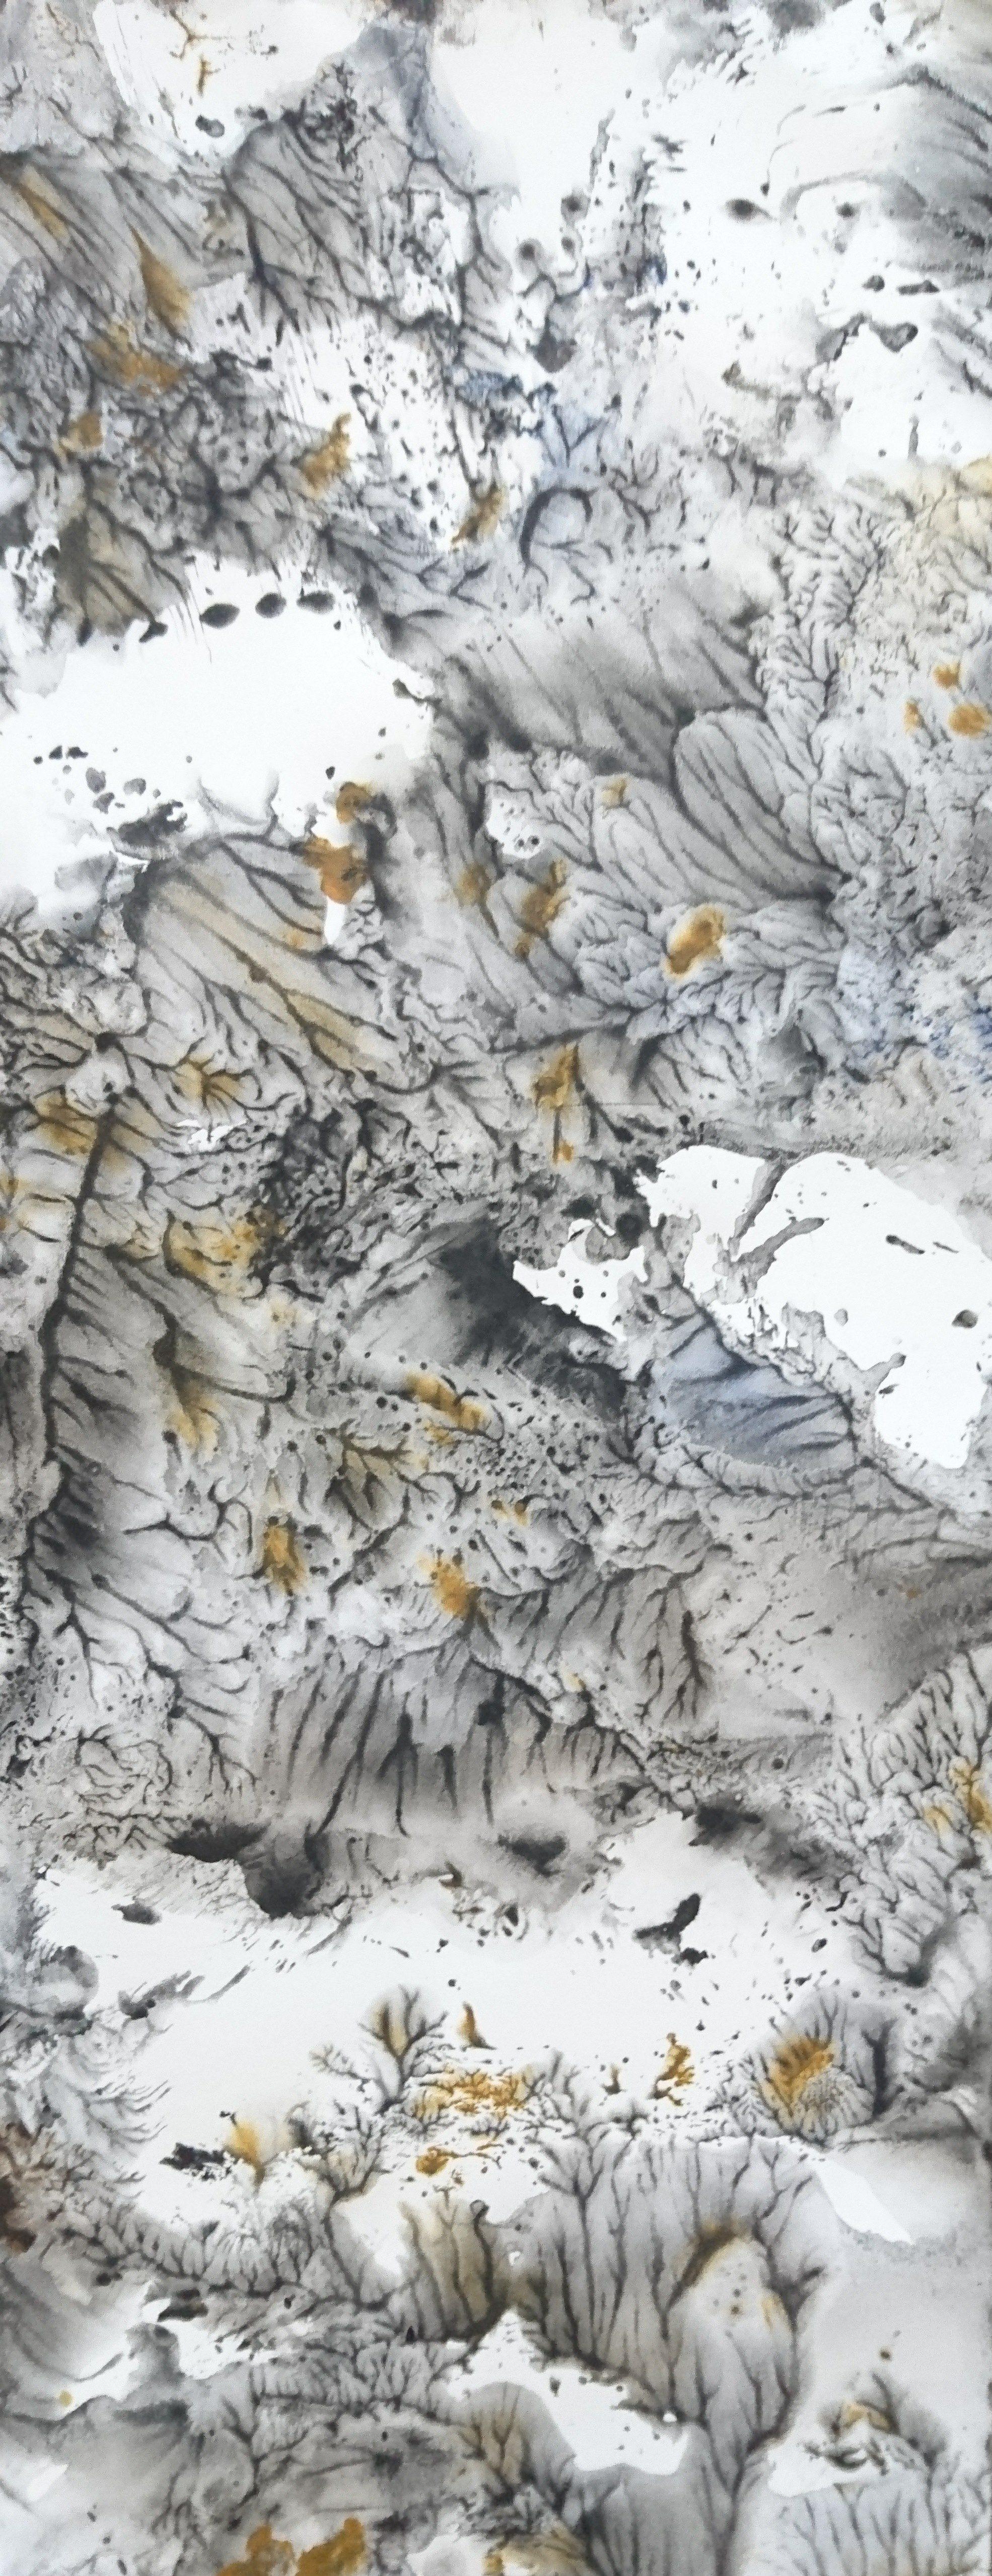 Yu Zhao, Montagne fleurie, tempera/paper/canvas, 65x25cm, 2019